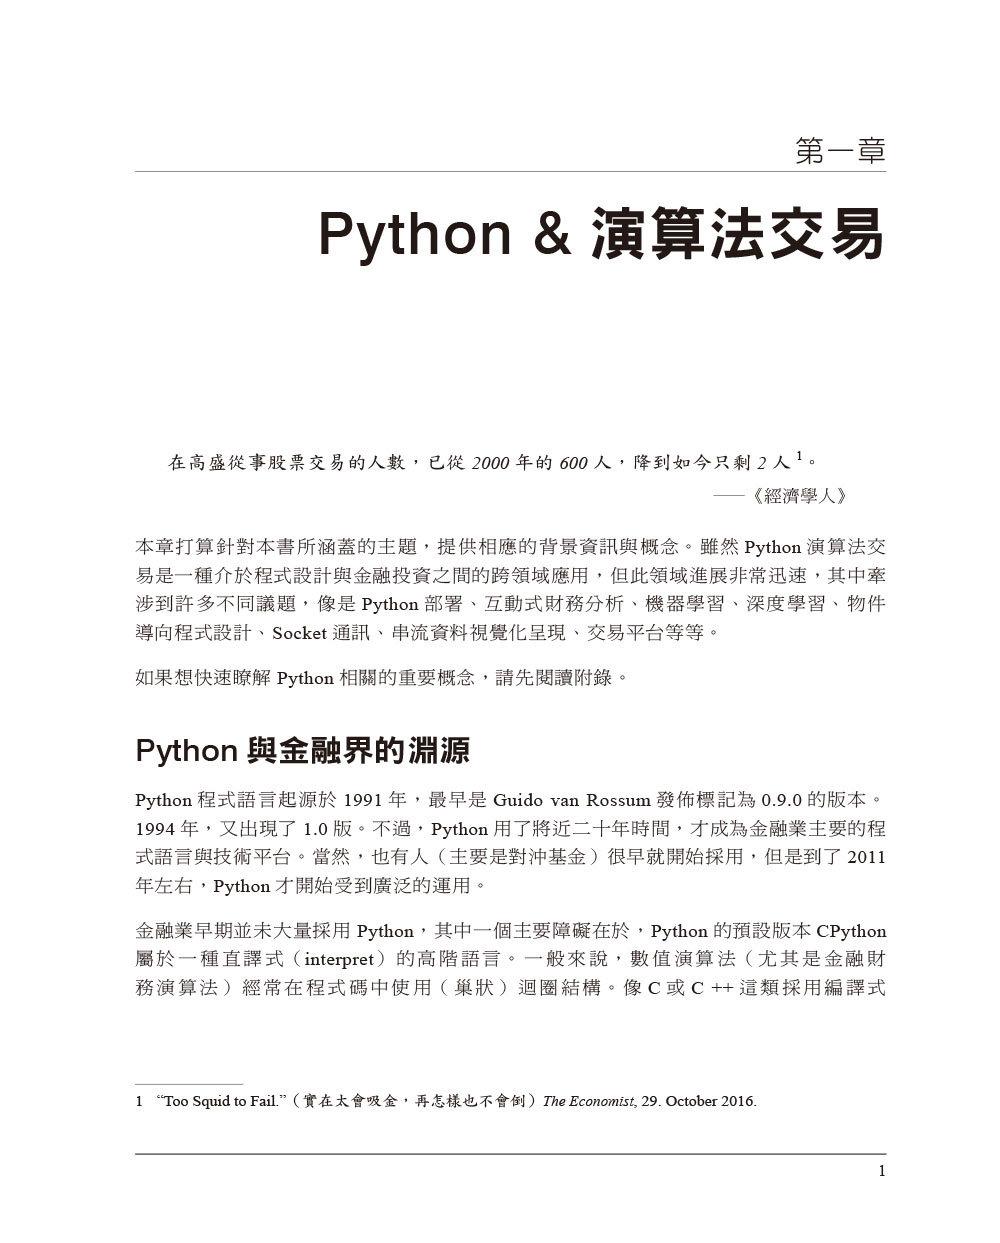 Python 演算法交易 (Python for Algorithmic Trading)-preview-7